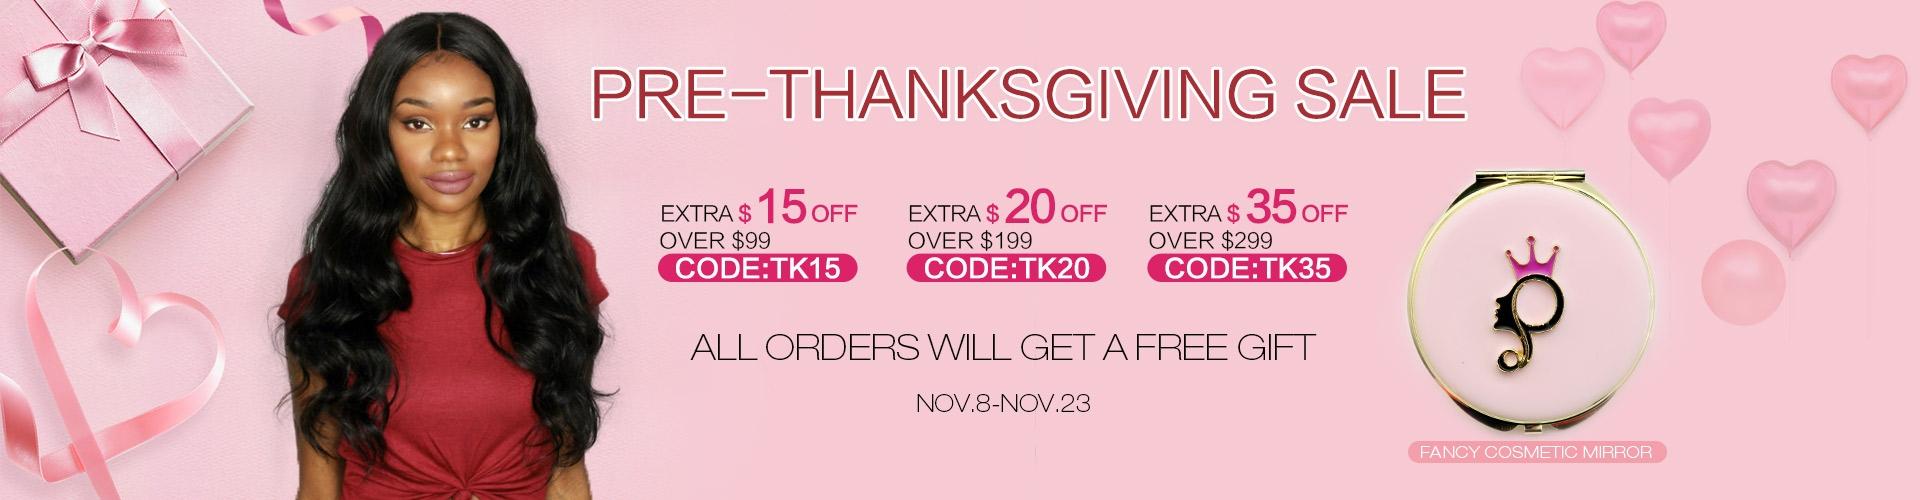 Pre-Thanksgiving sale 2017